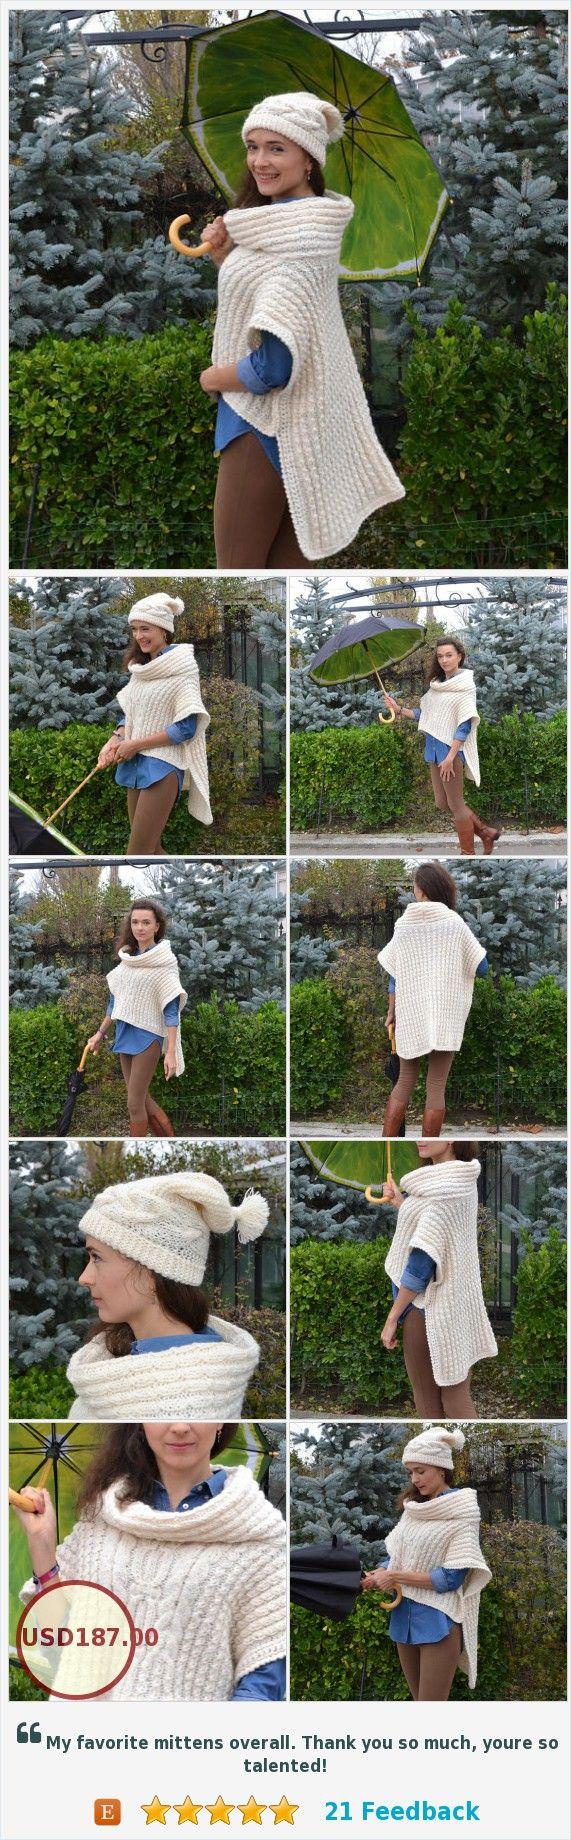 #WomensCape #BeanieasaGift #KnittedCape #PonchoCape #WhiteCape #PonchoWrap #WoolCape #CapeCoat #CapeJacket #WinterCape #CapeCapelet #OversizedCape https://www.etsy.com/Monpasier/listing/573370079/womens-cape-beanie-as-a-gift-knitted?ref=shop_home_active_1